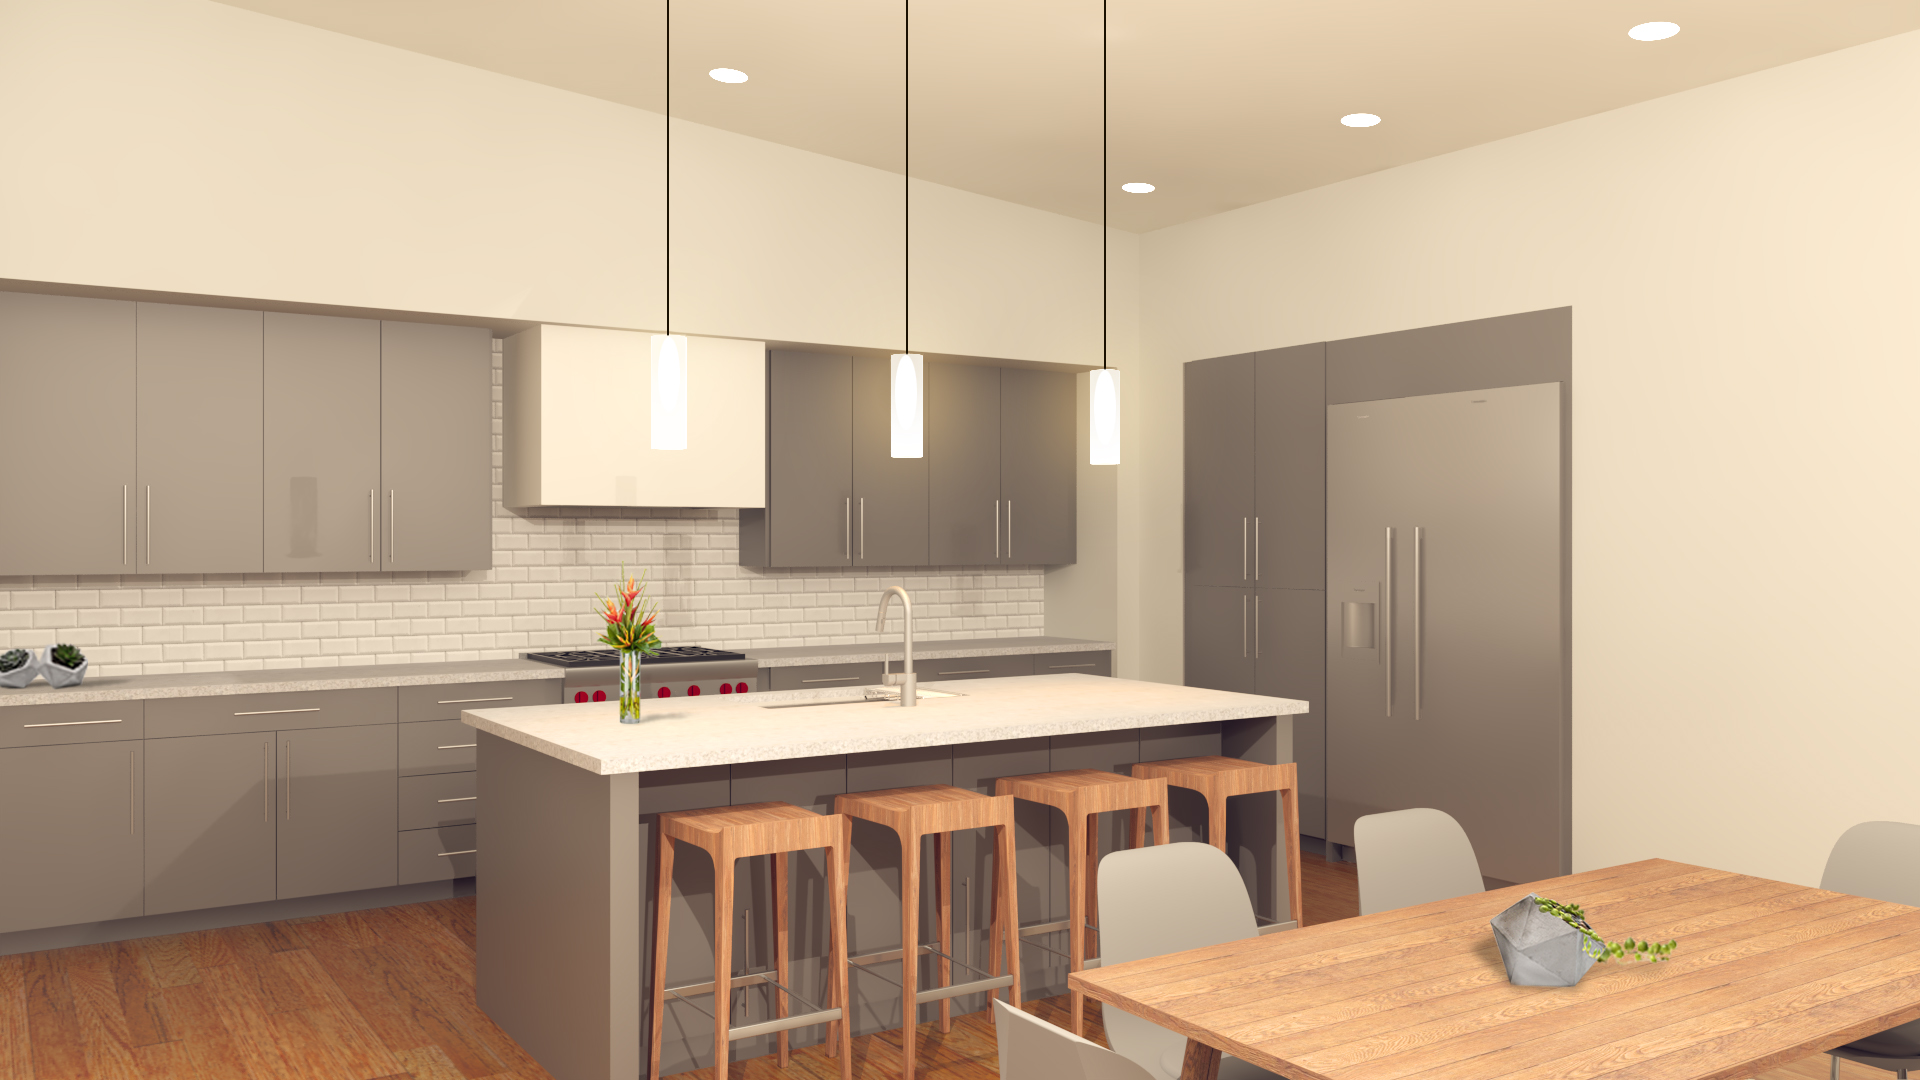 Kitchen 2.effectsResultEDIT.jpg